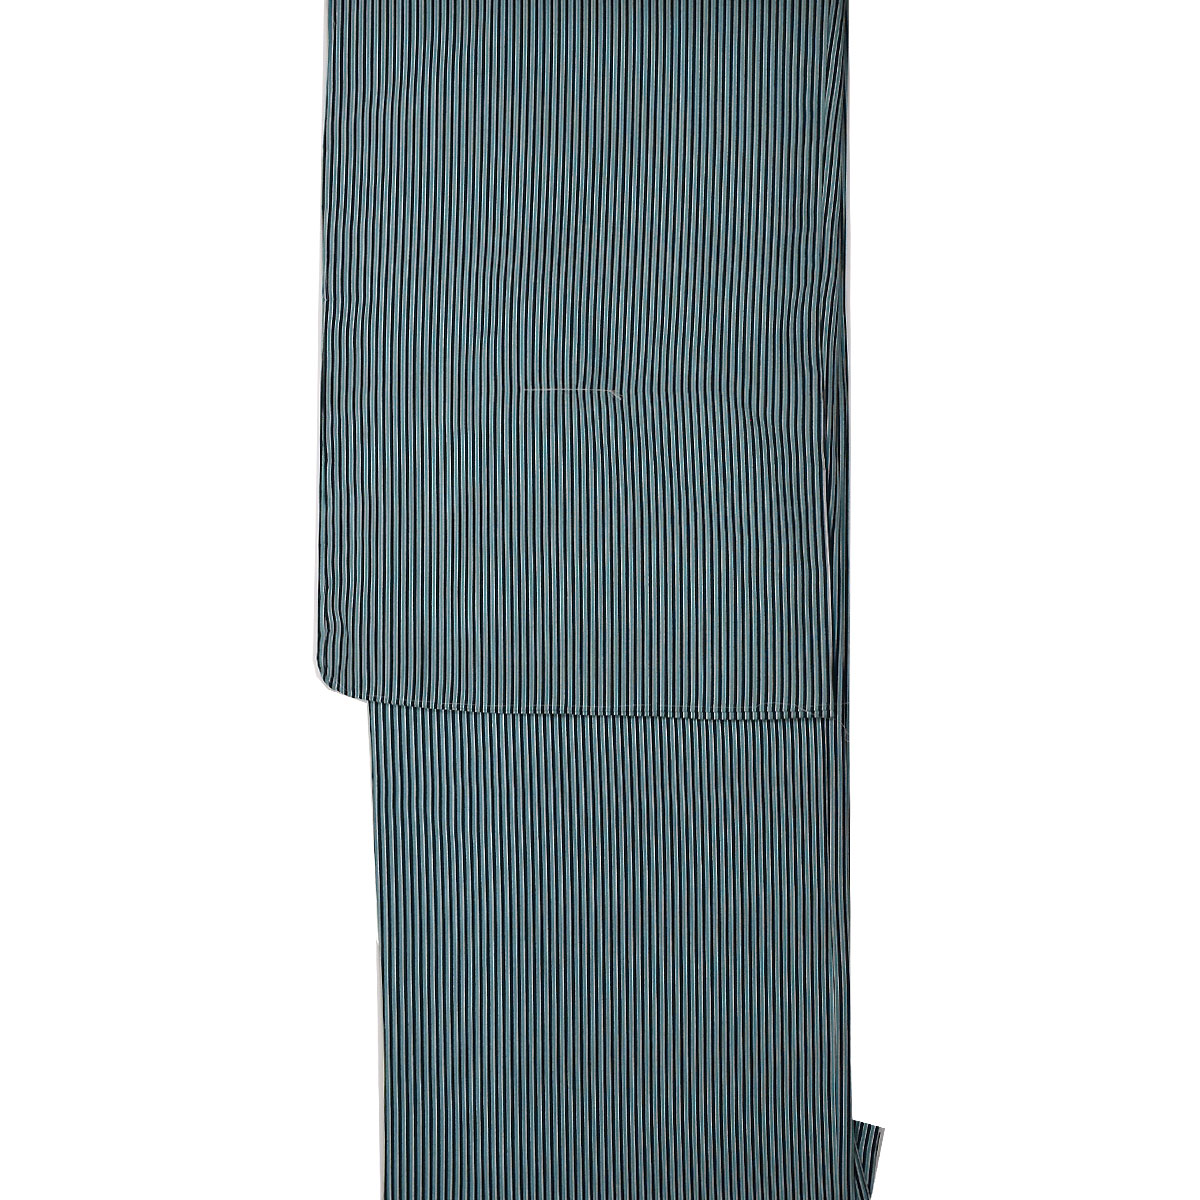 【M寸】 洗える着物 【 袷 】【 江戸小紋 】 【 仕立て上がり 】 洗える 着物 単品商品番号d914-56